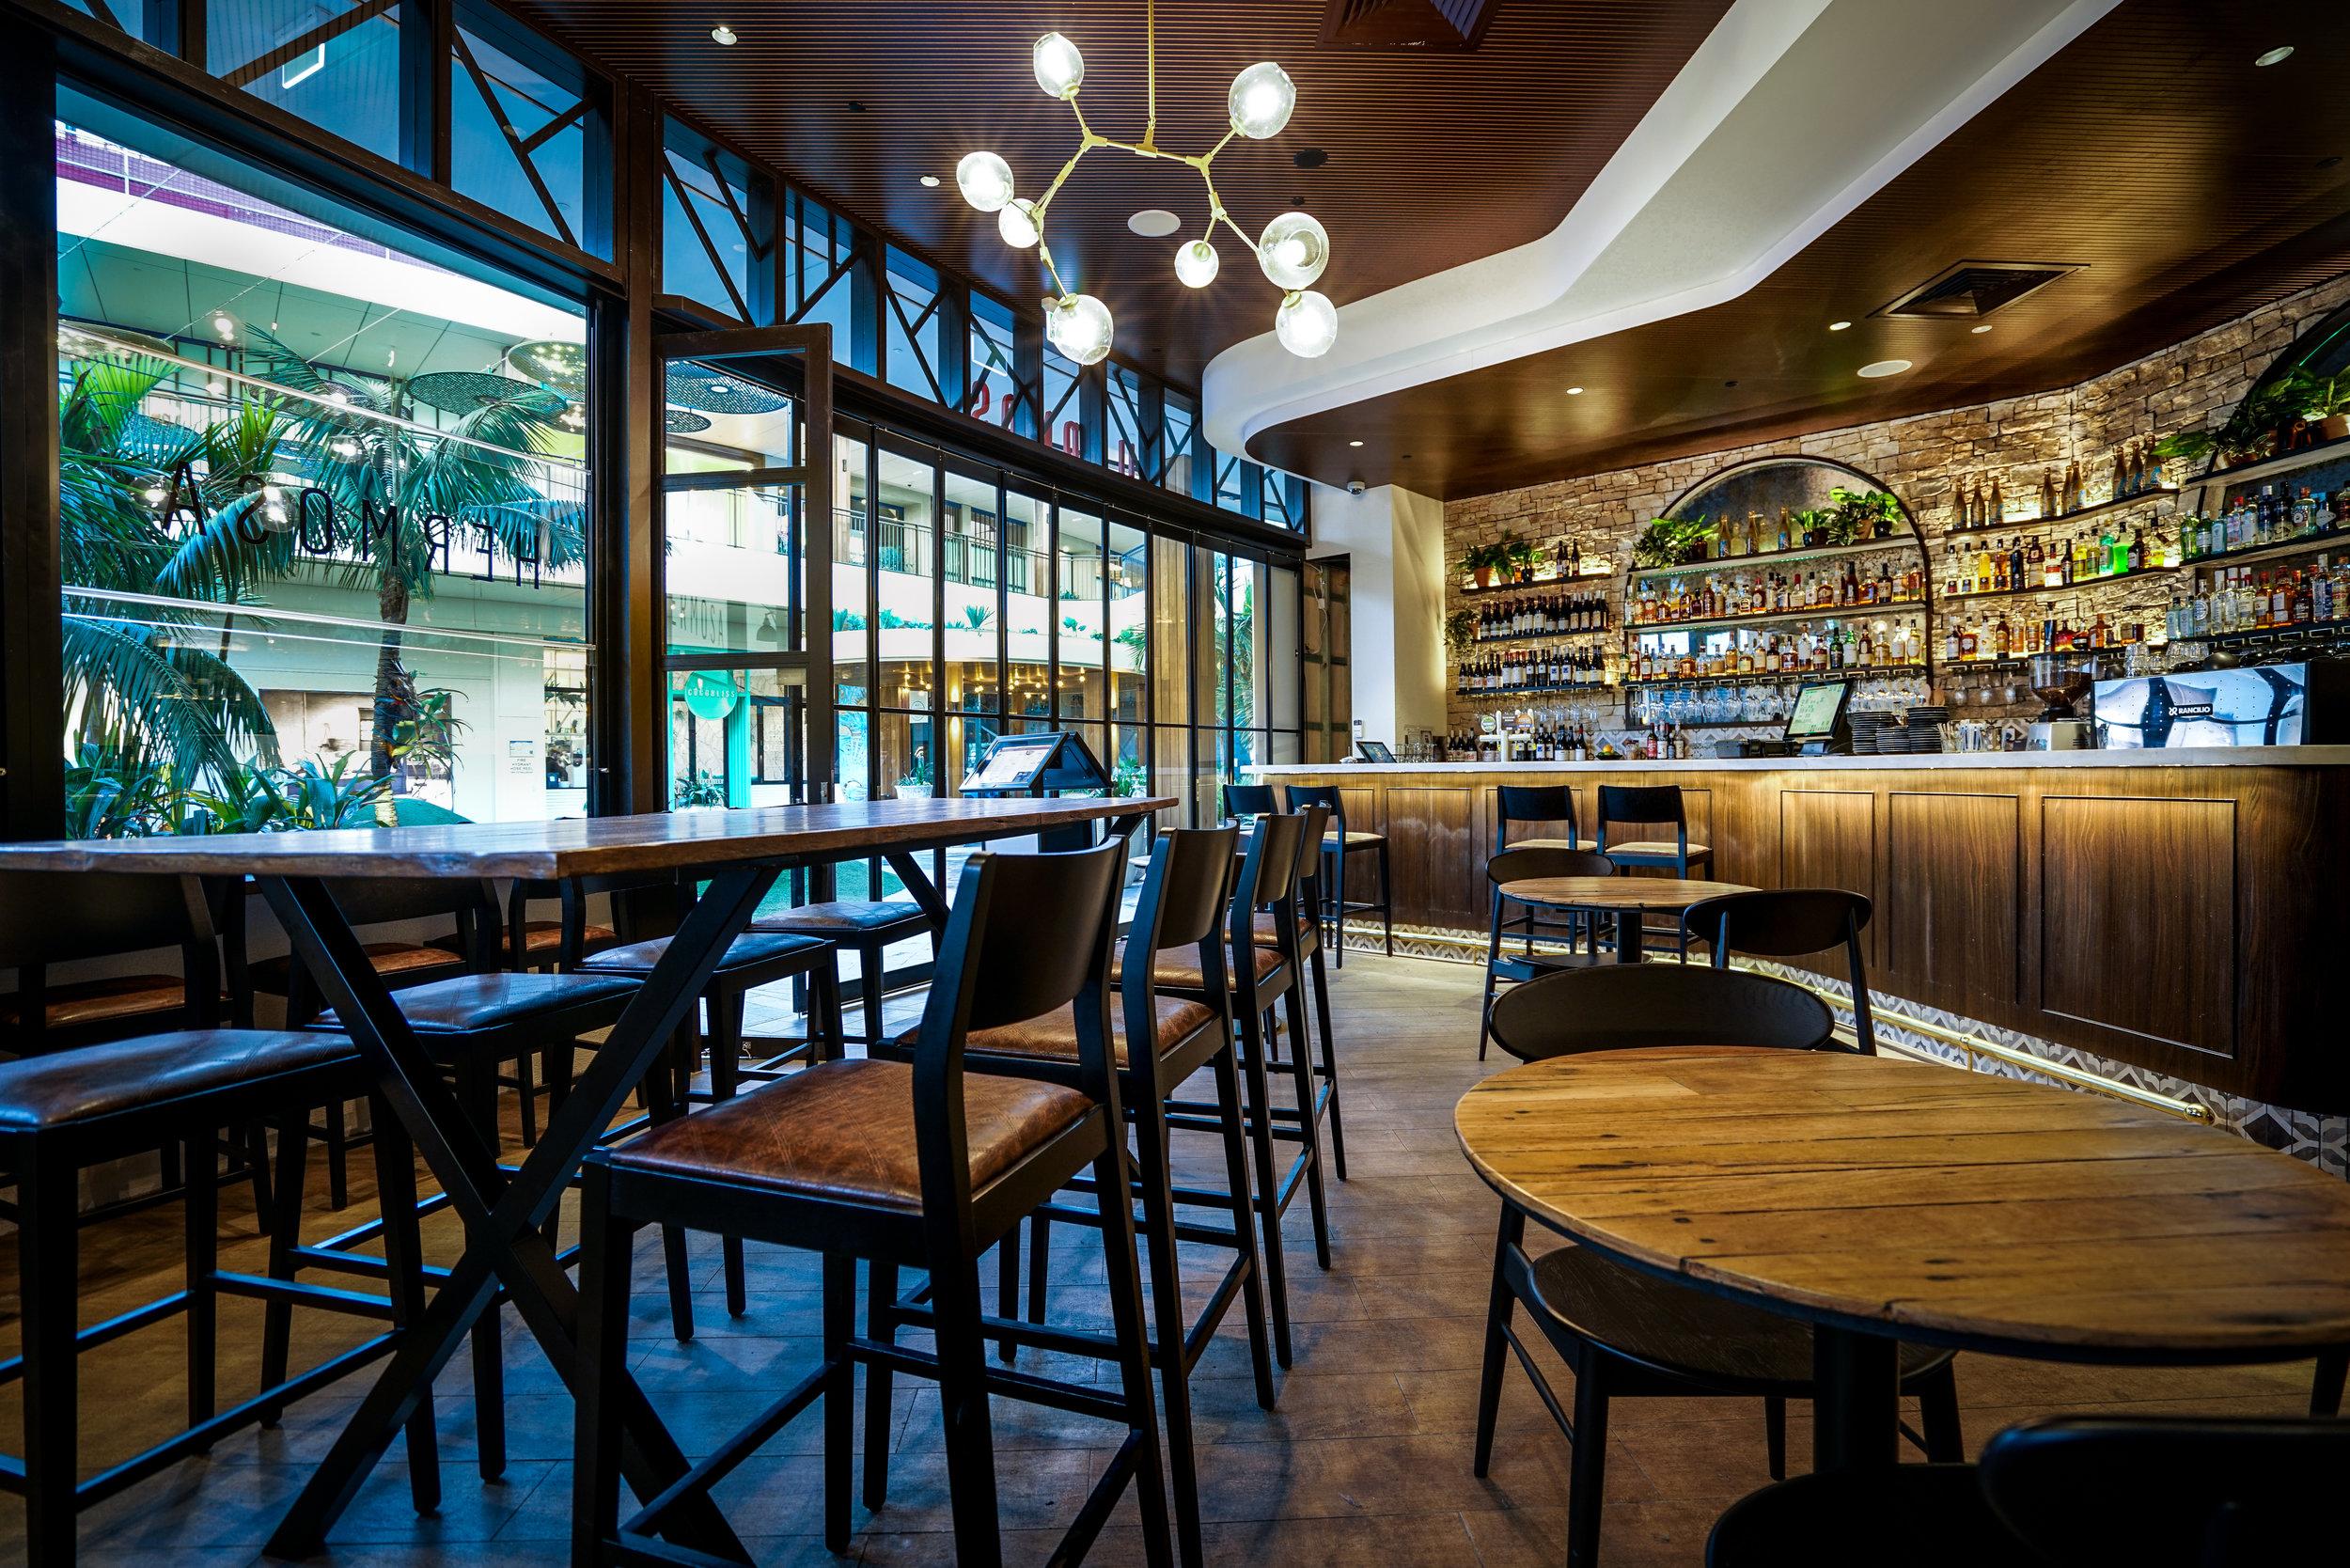 Hermosa Indoor Dining - Collectivus Interior Design